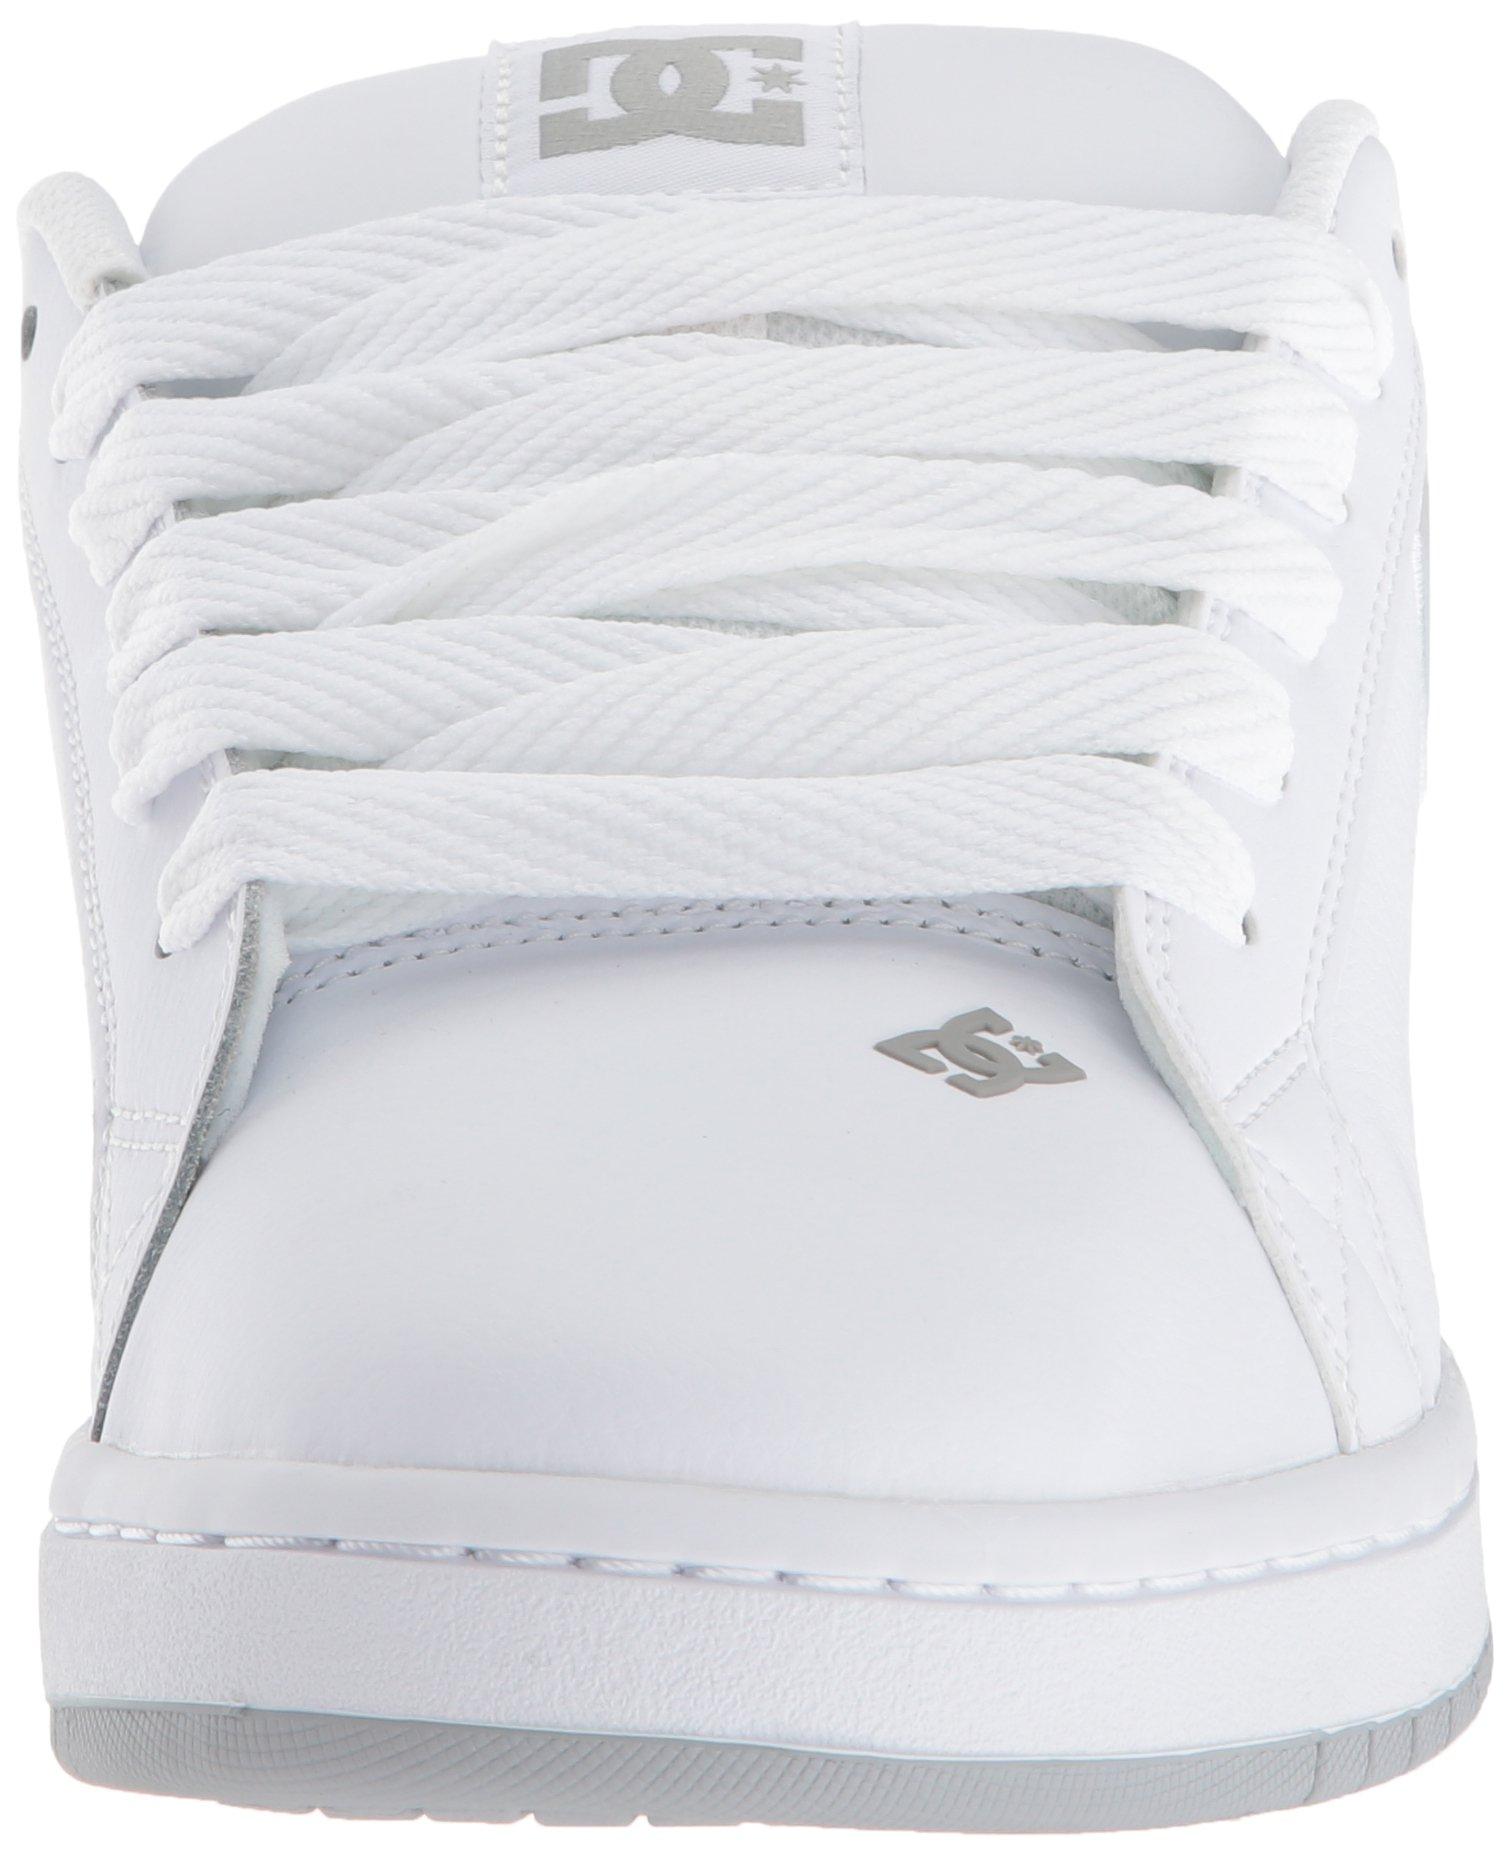 DC Men's Court Graffik SE Skate Shoe White Grey, 15 Medium US by DC (Image #4)